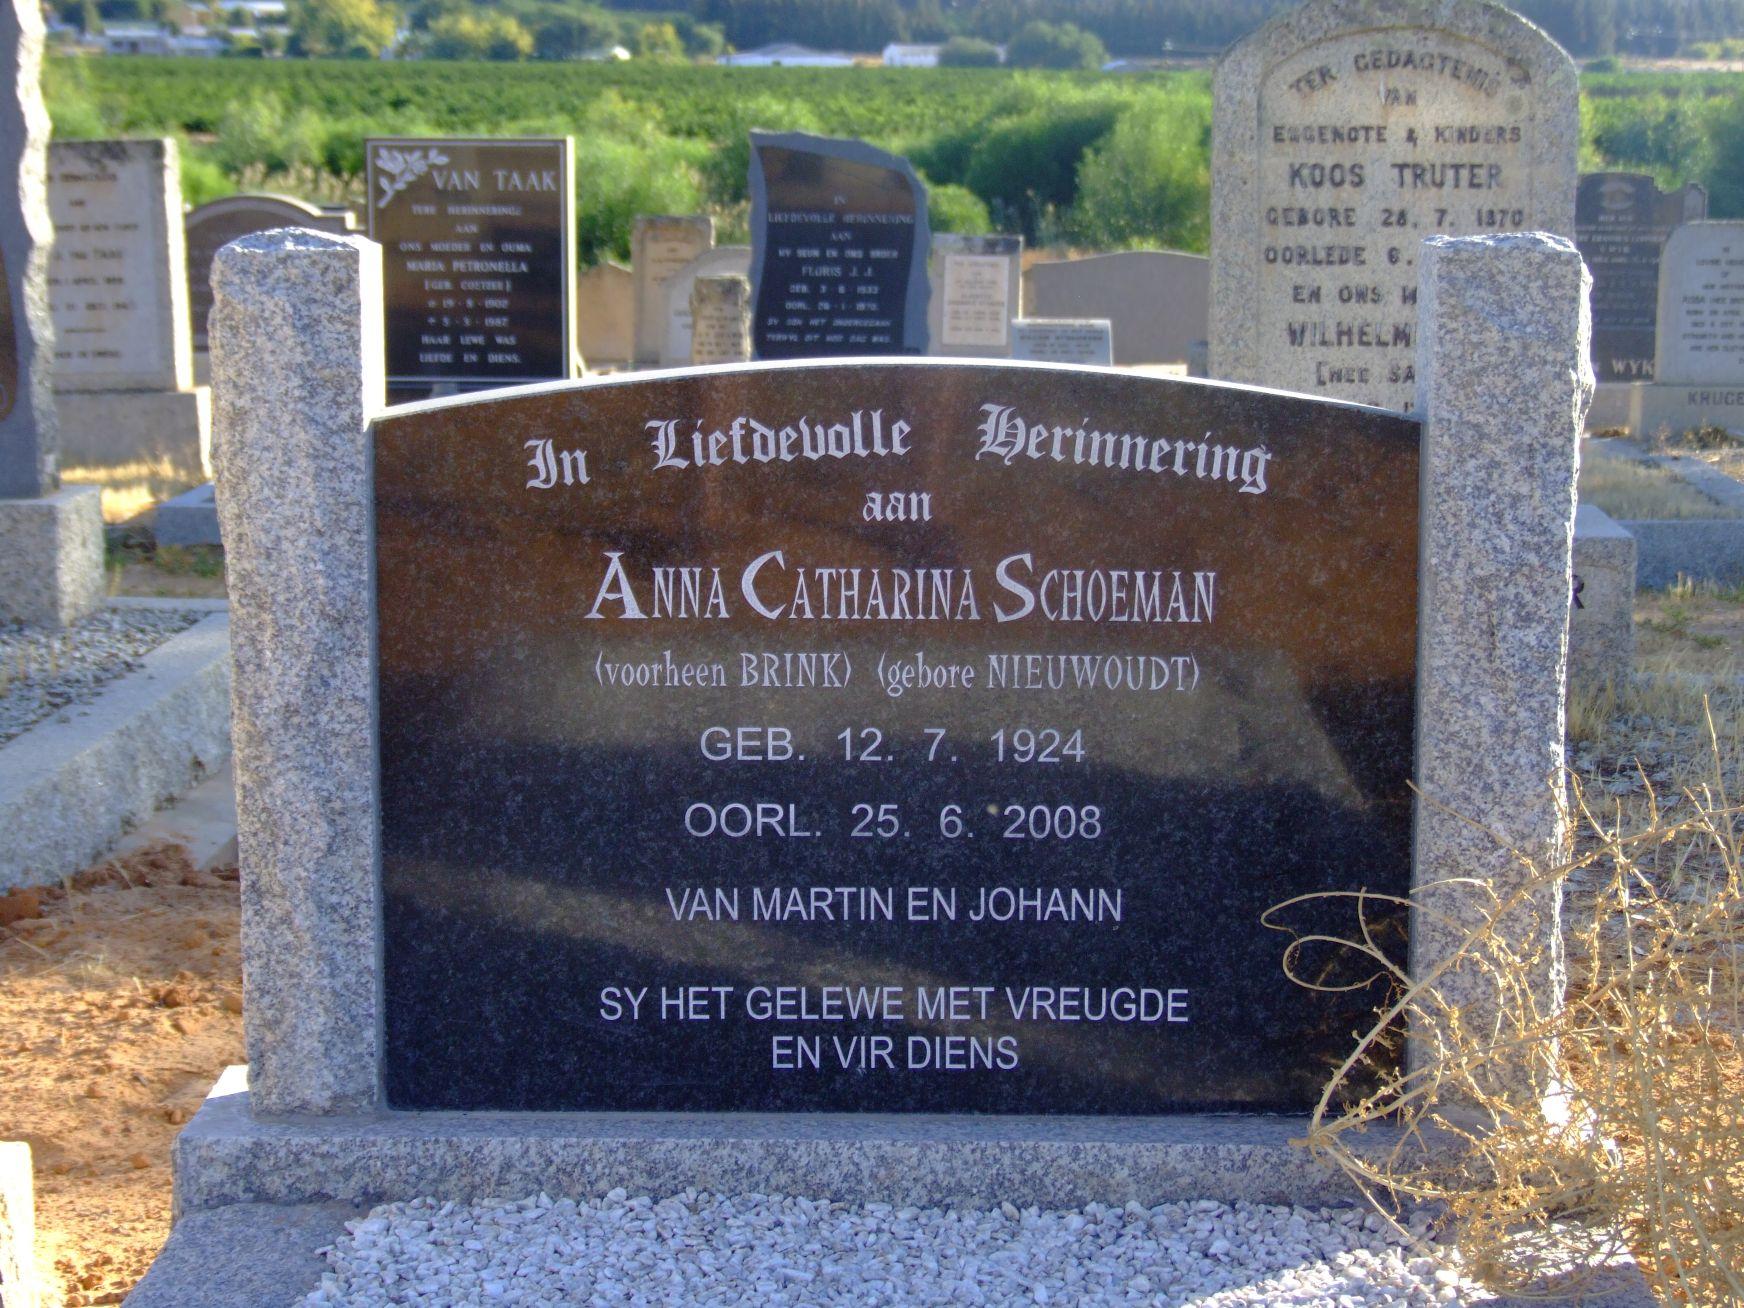 Schoeman, Anna Catharina